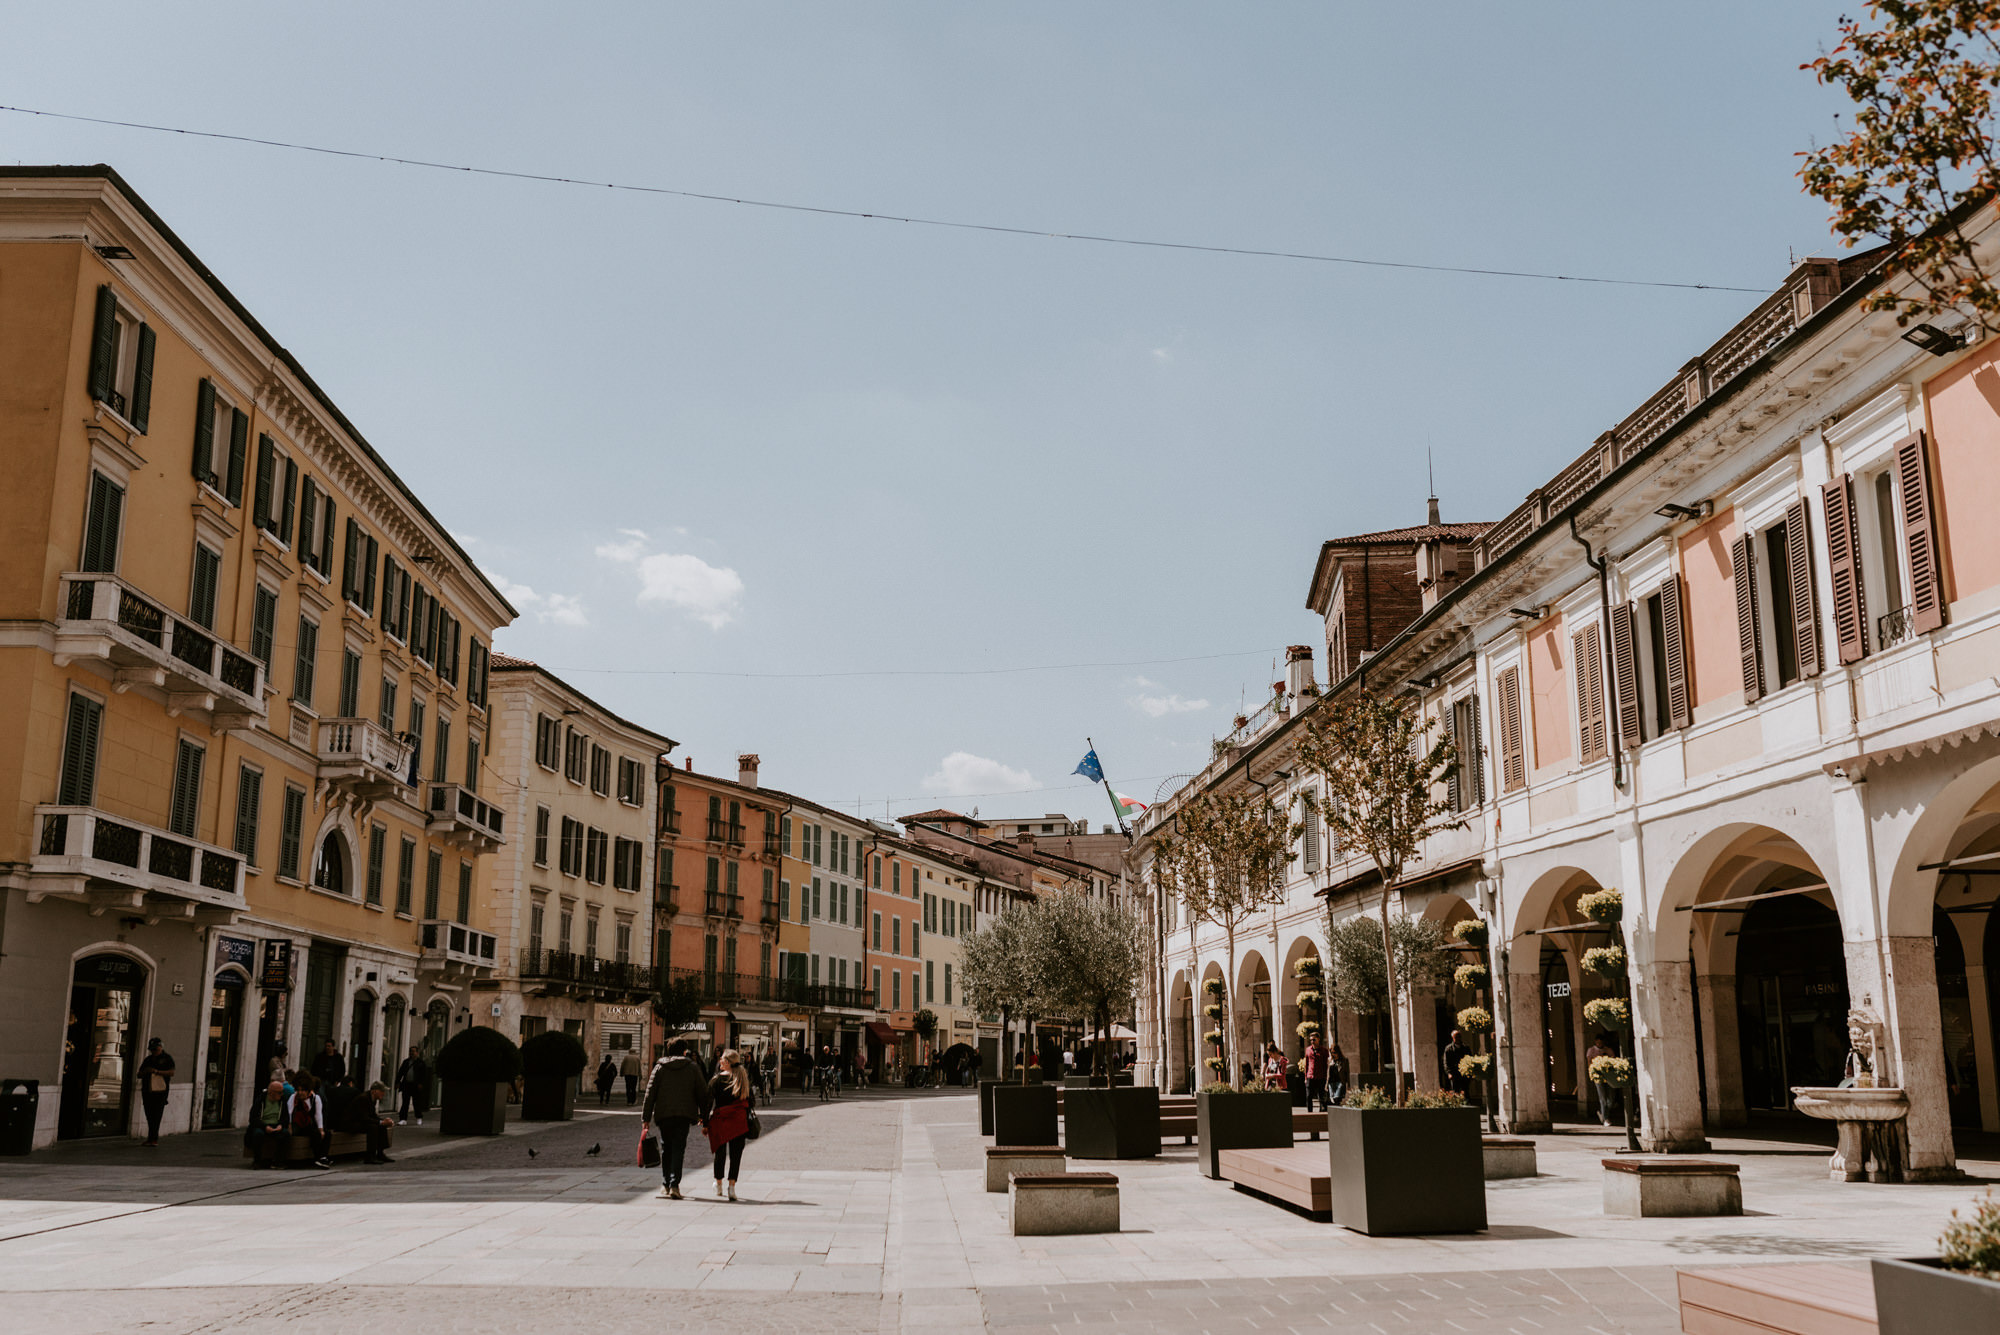 FOTO+PHOTO+BODA+WEDDING+ITALIA+ITALY+MAURICIO+GARAY+MAURICIOGARAY+WEDDINPHOTOGRAPHER+FOTOGRAFODEBODA-2.jpg